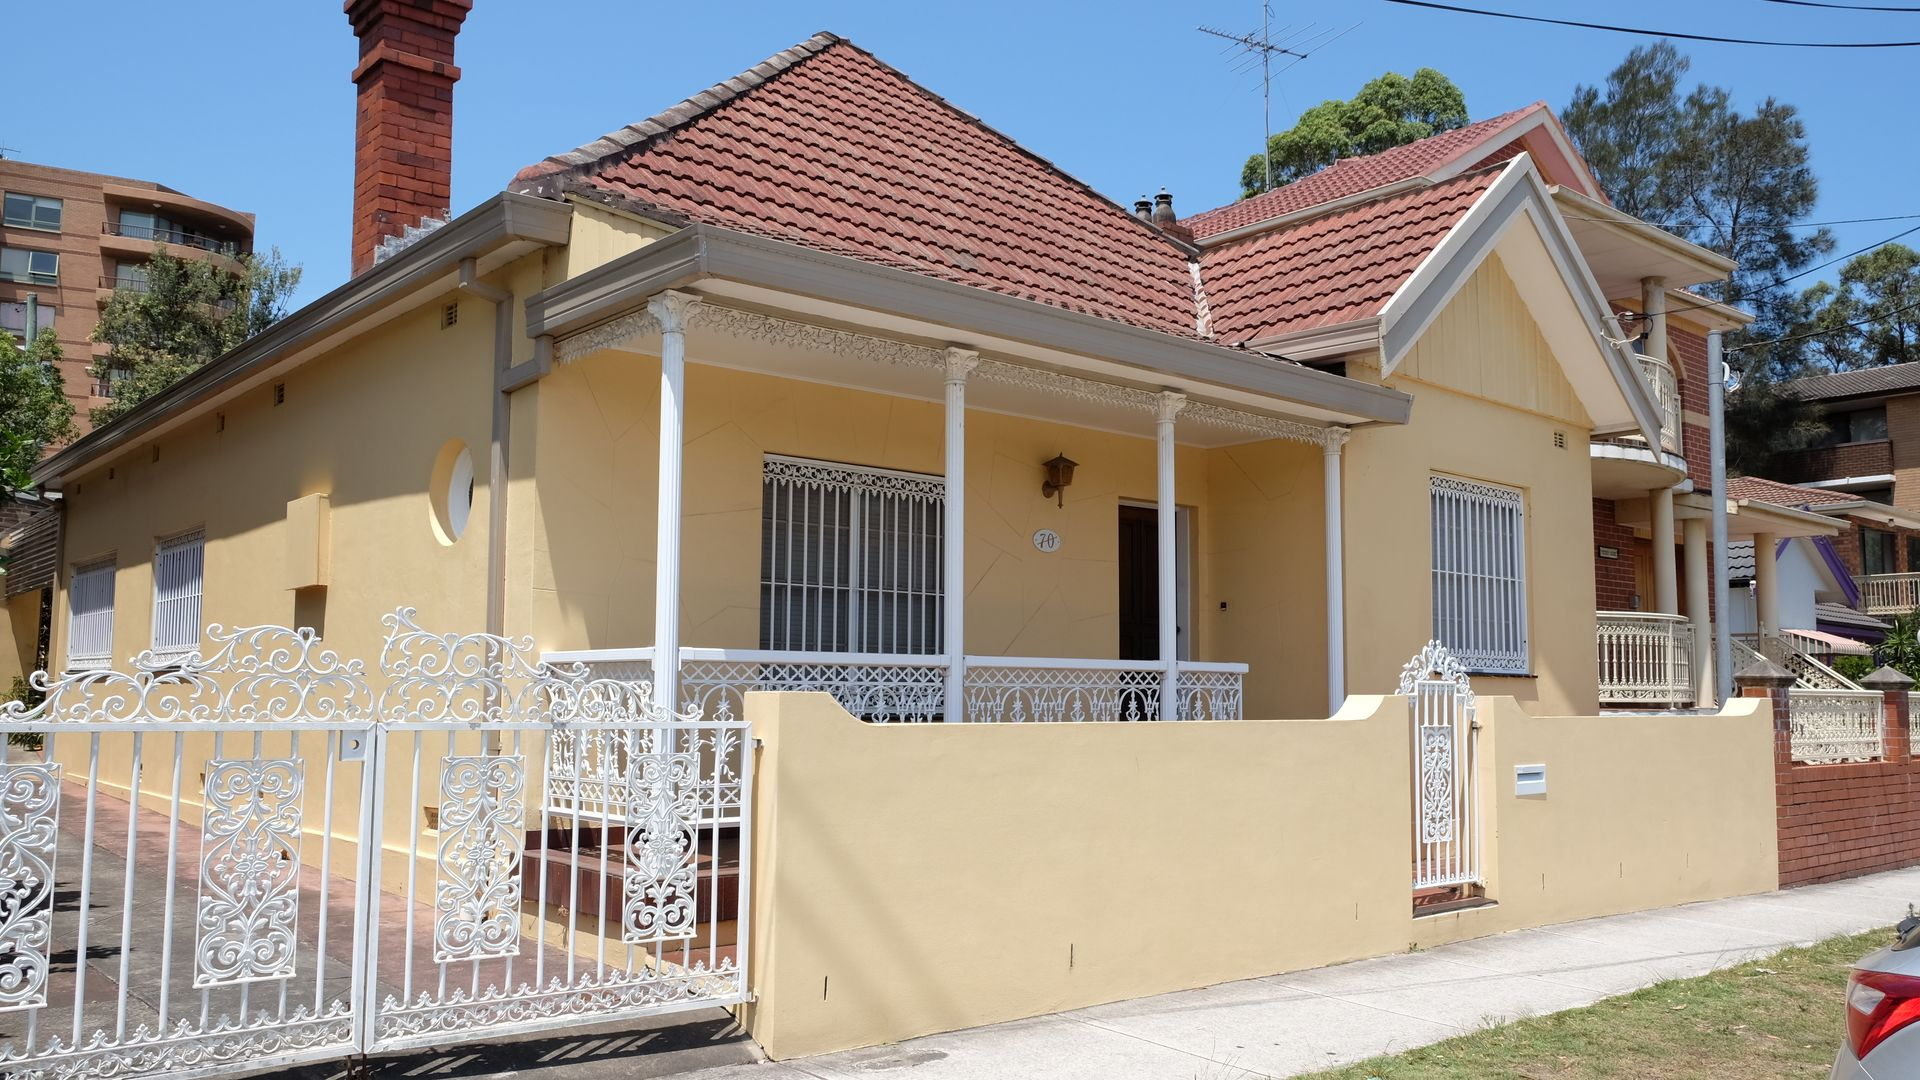 70 Houston Road, Kingsford NSW 2032, Image 0